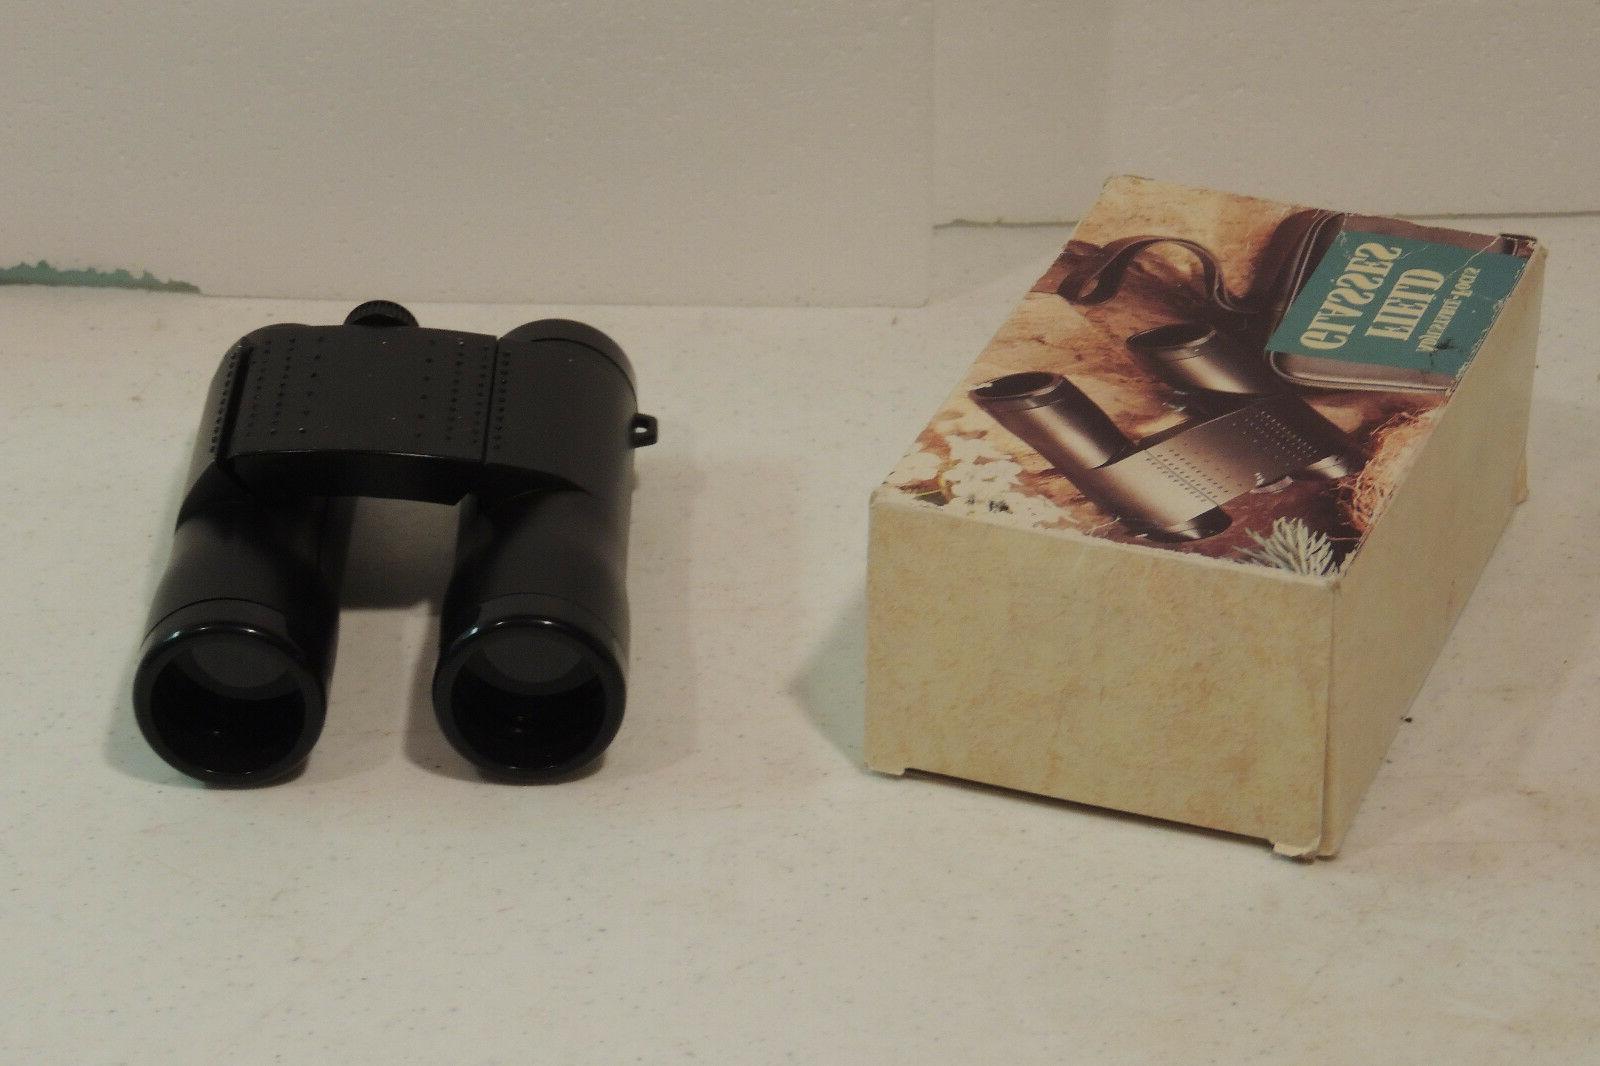 binocular adjustable focus field glass in black